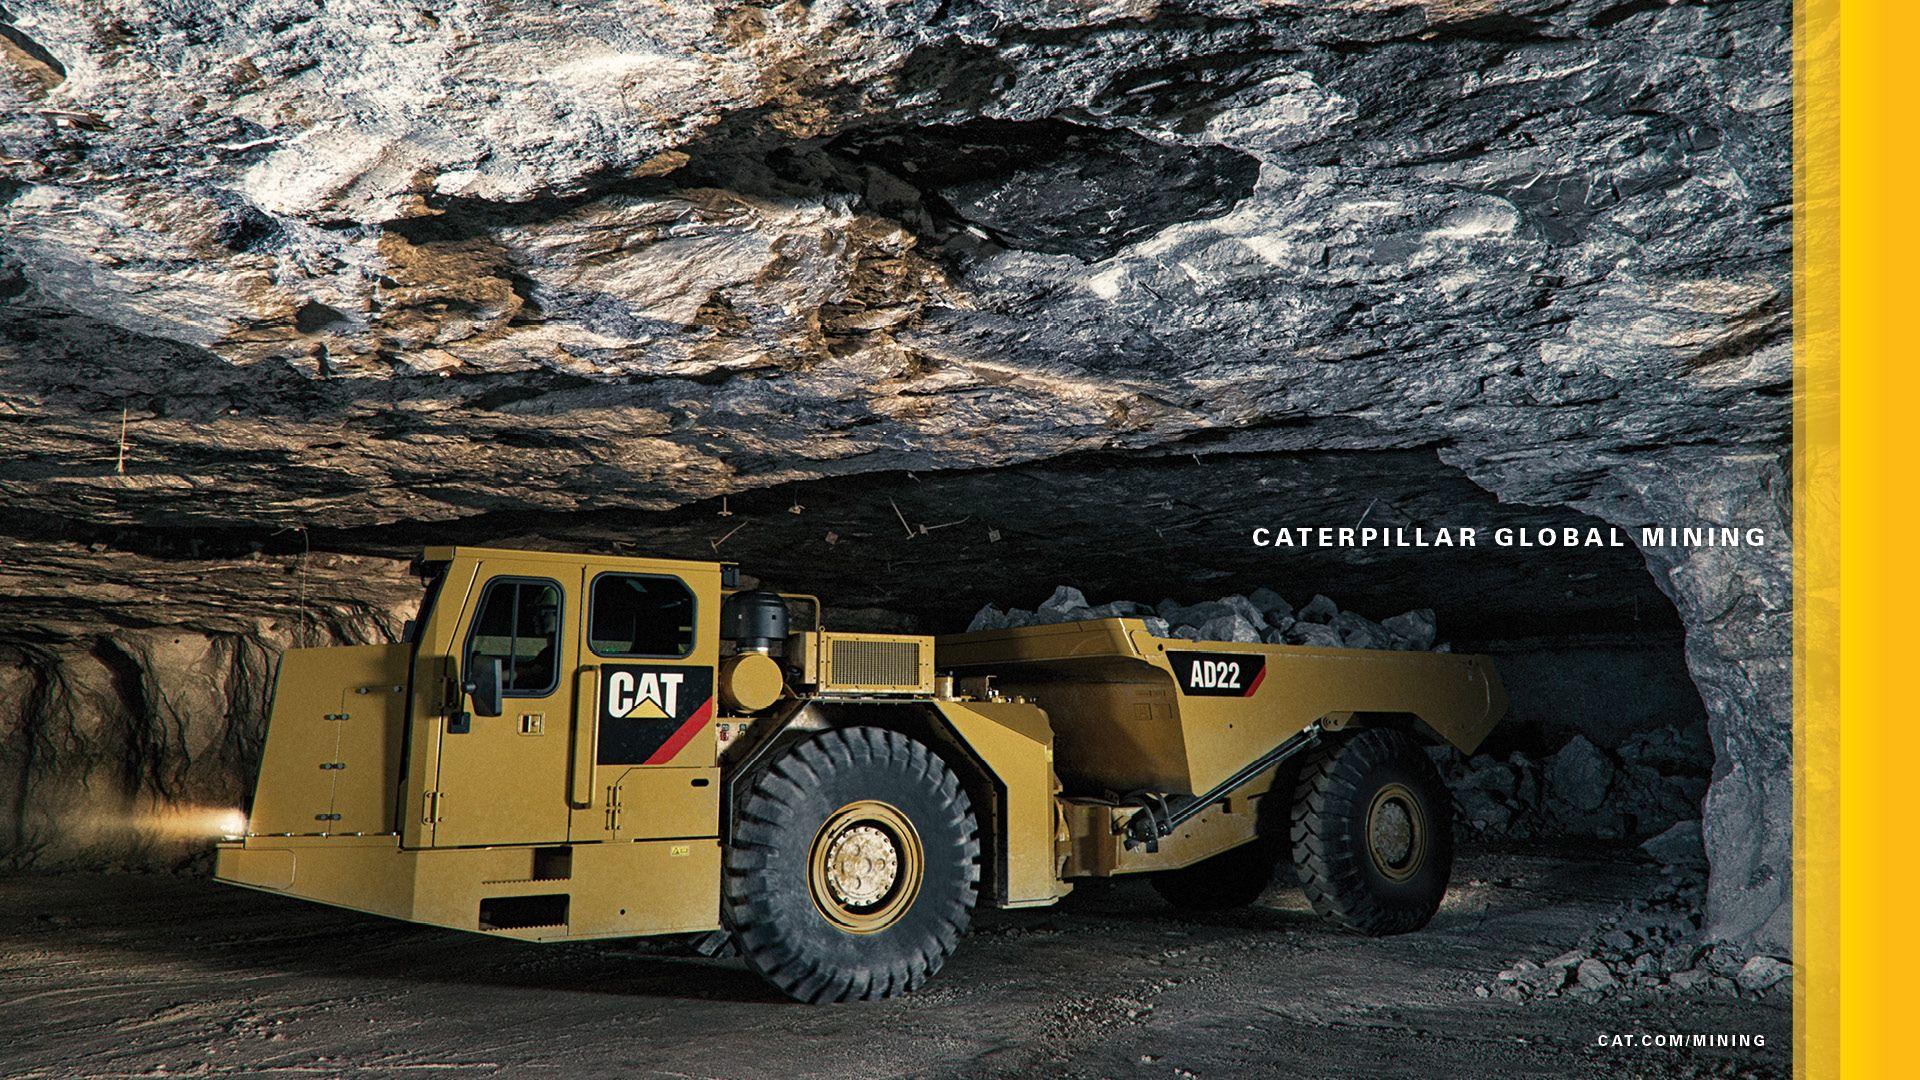 Cat AD22 Underground Mining Desktop Wallpaper